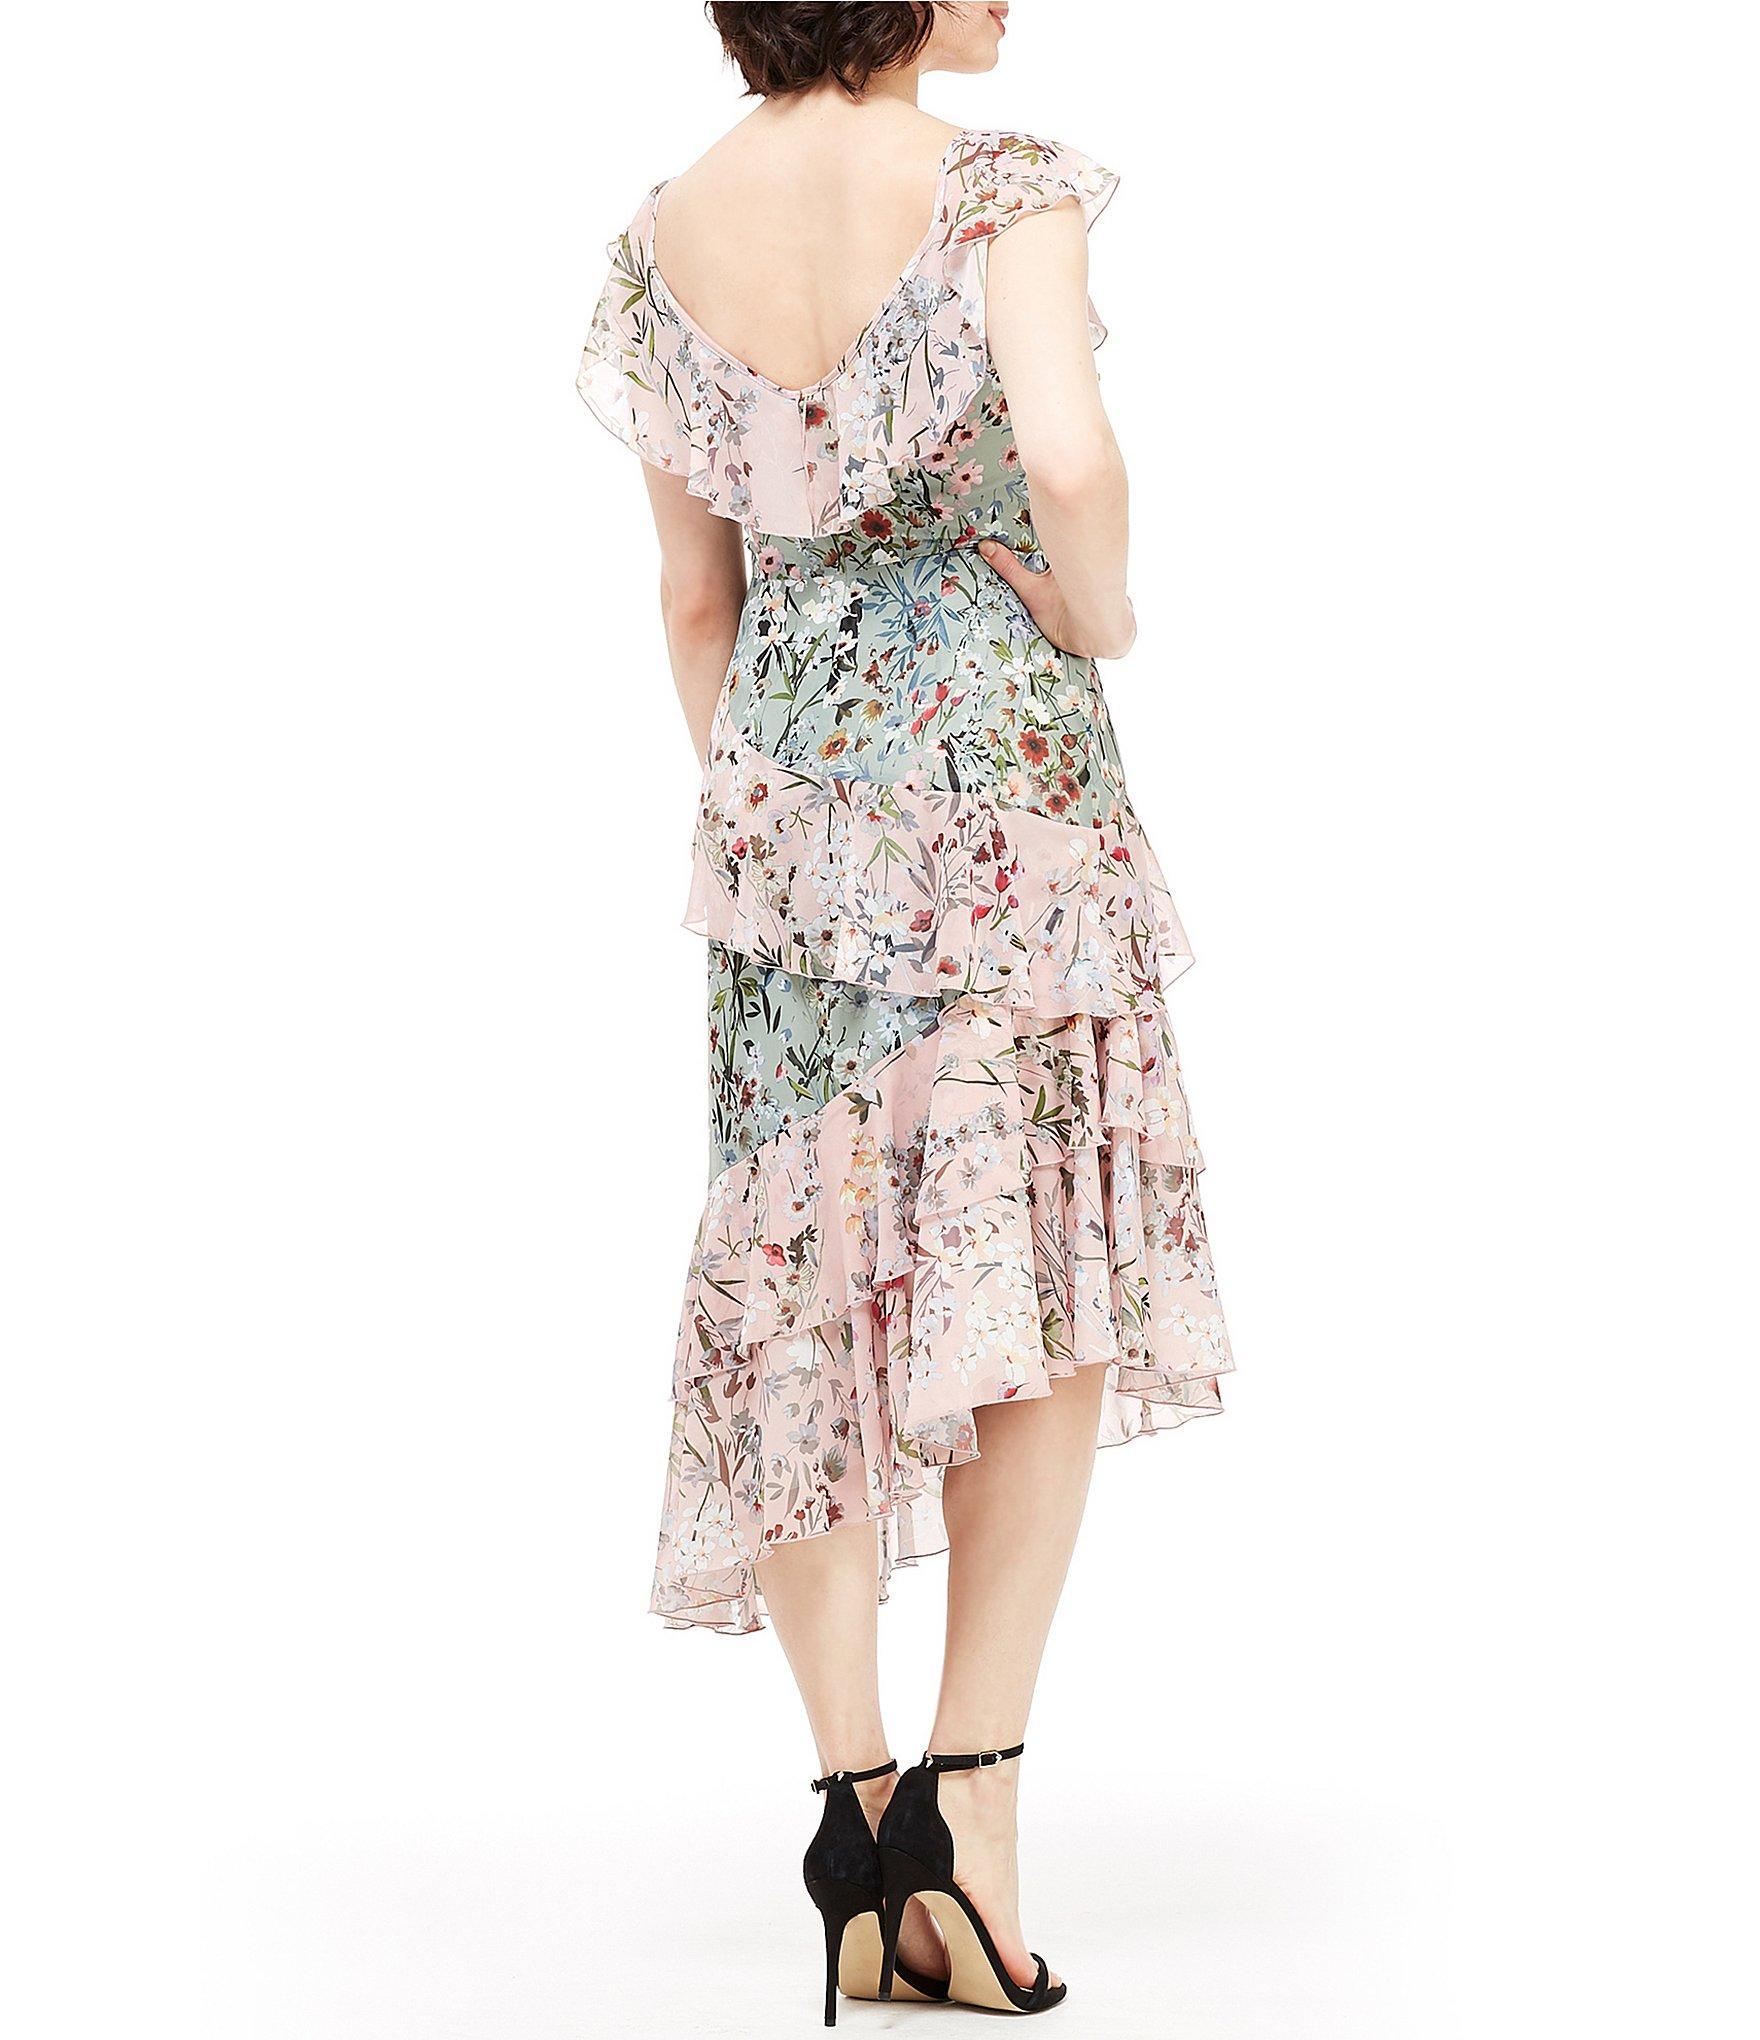 Maggy London - Multicolor Floral Print Ruffle Asymmetrical Hem Midi Dress -  Lyst. View fullscreen 1b8801cd8